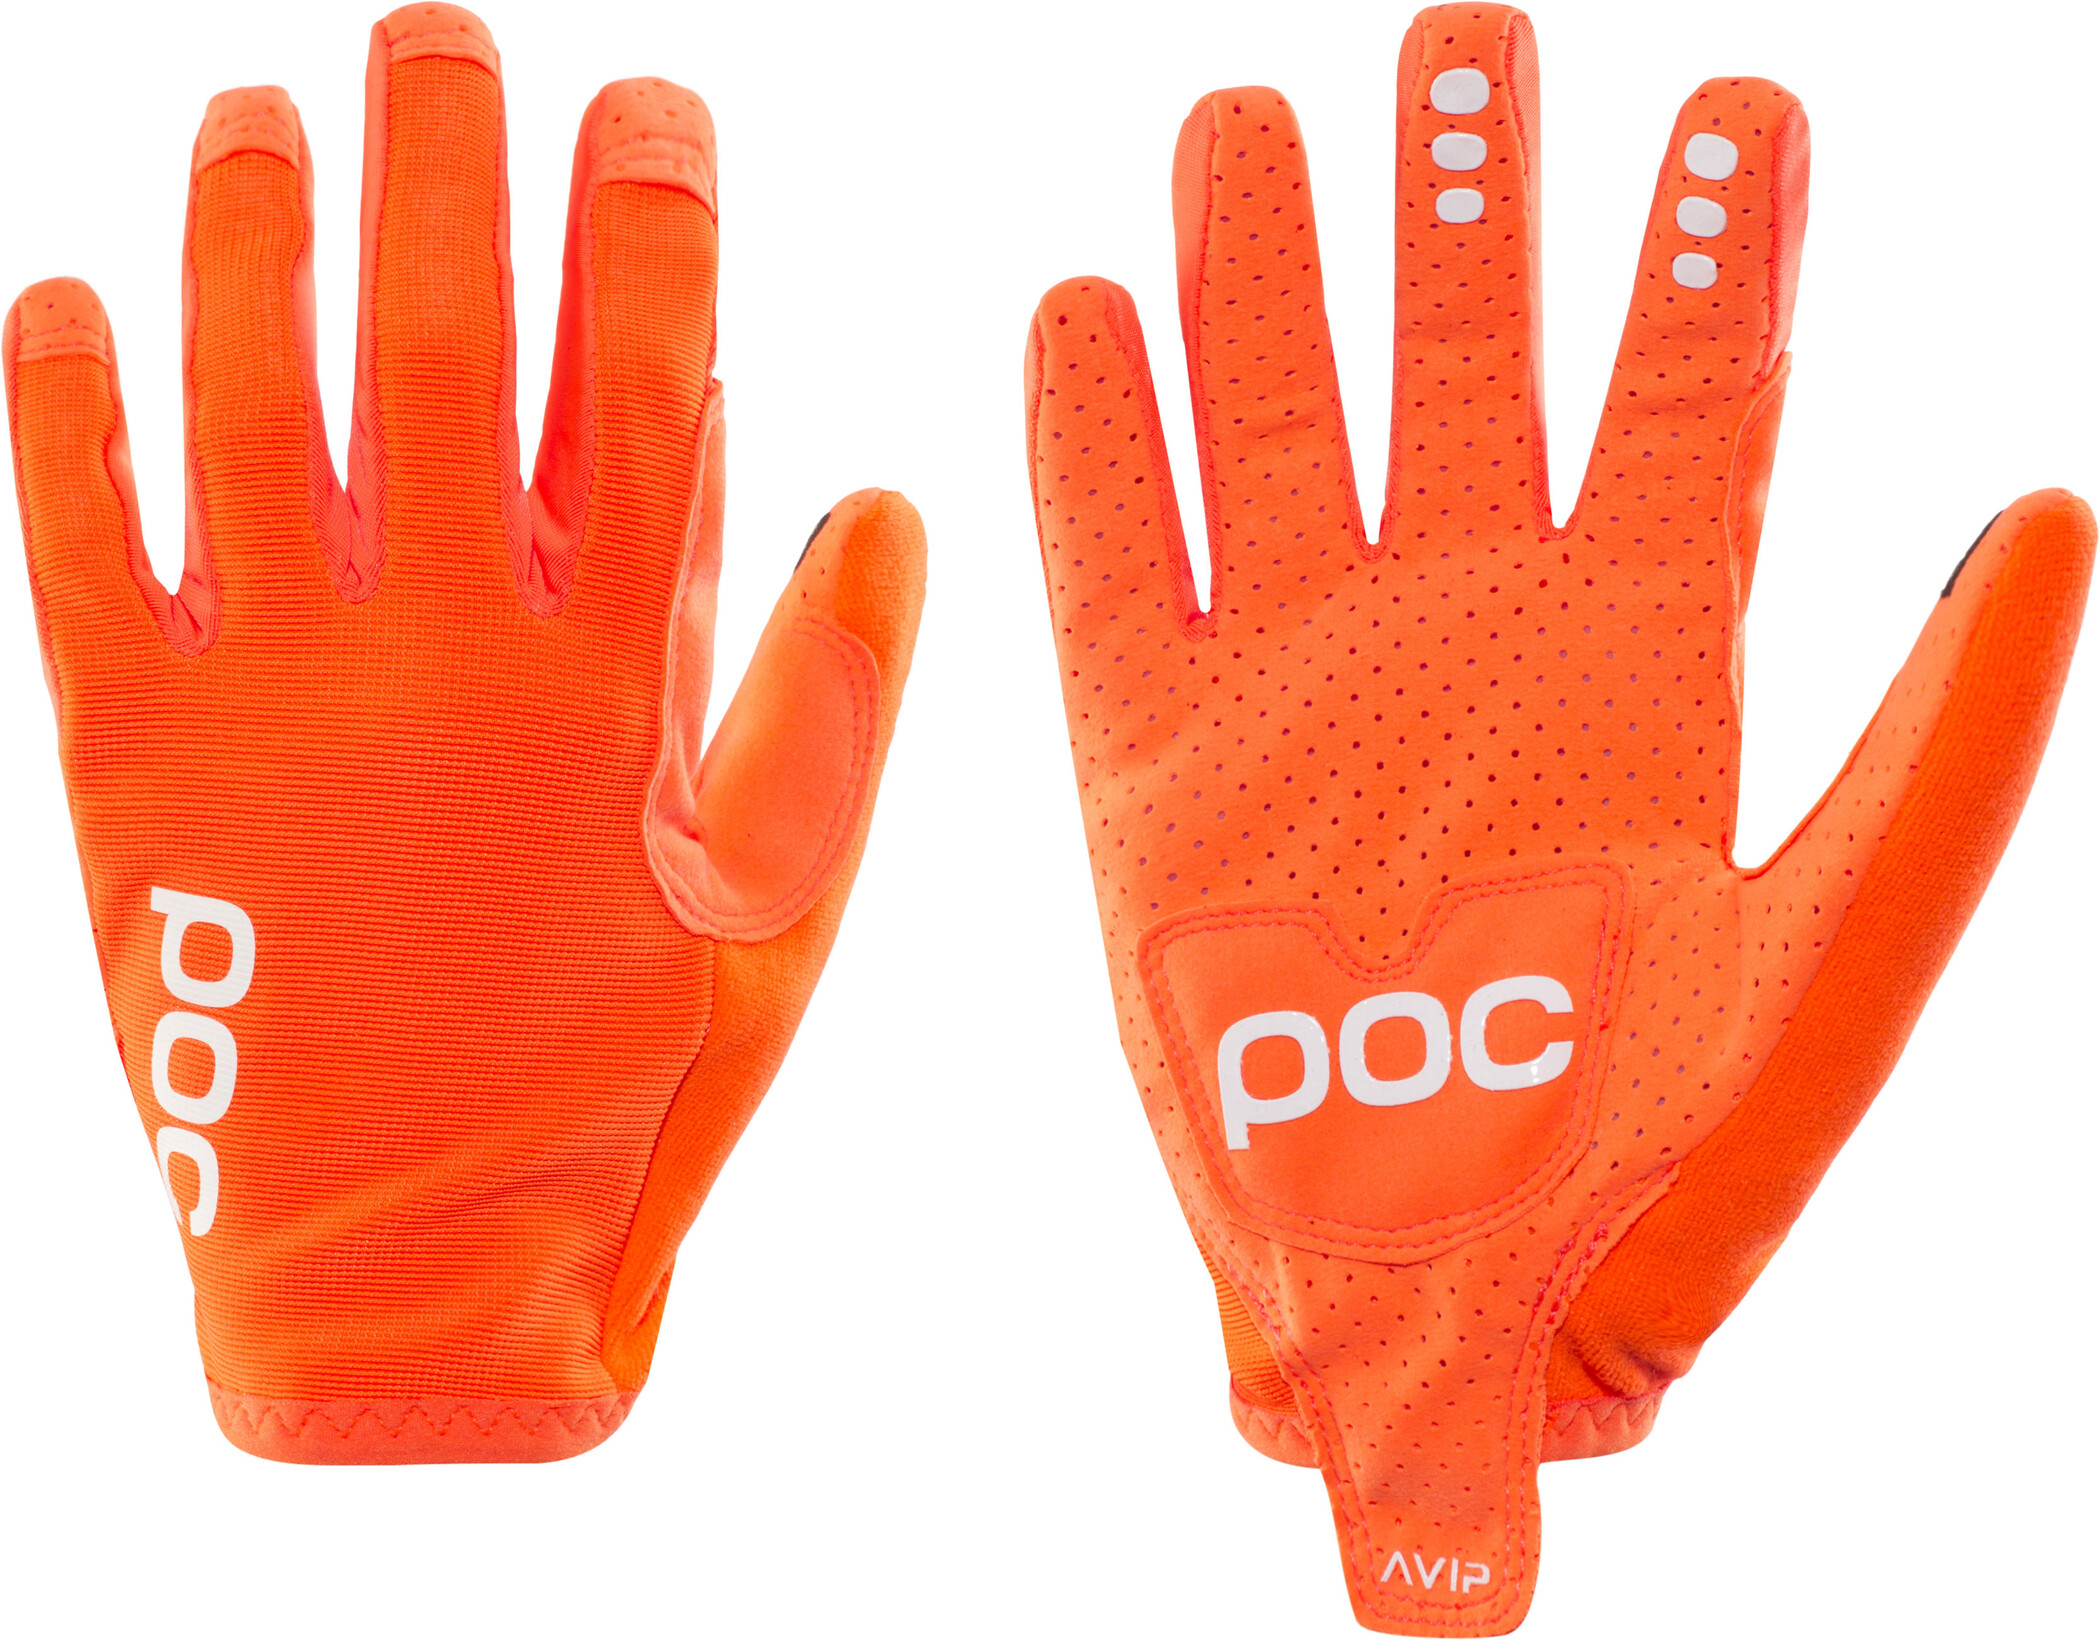 POC AVIP Cykelhandsker, zink orange (2020) | Gloves